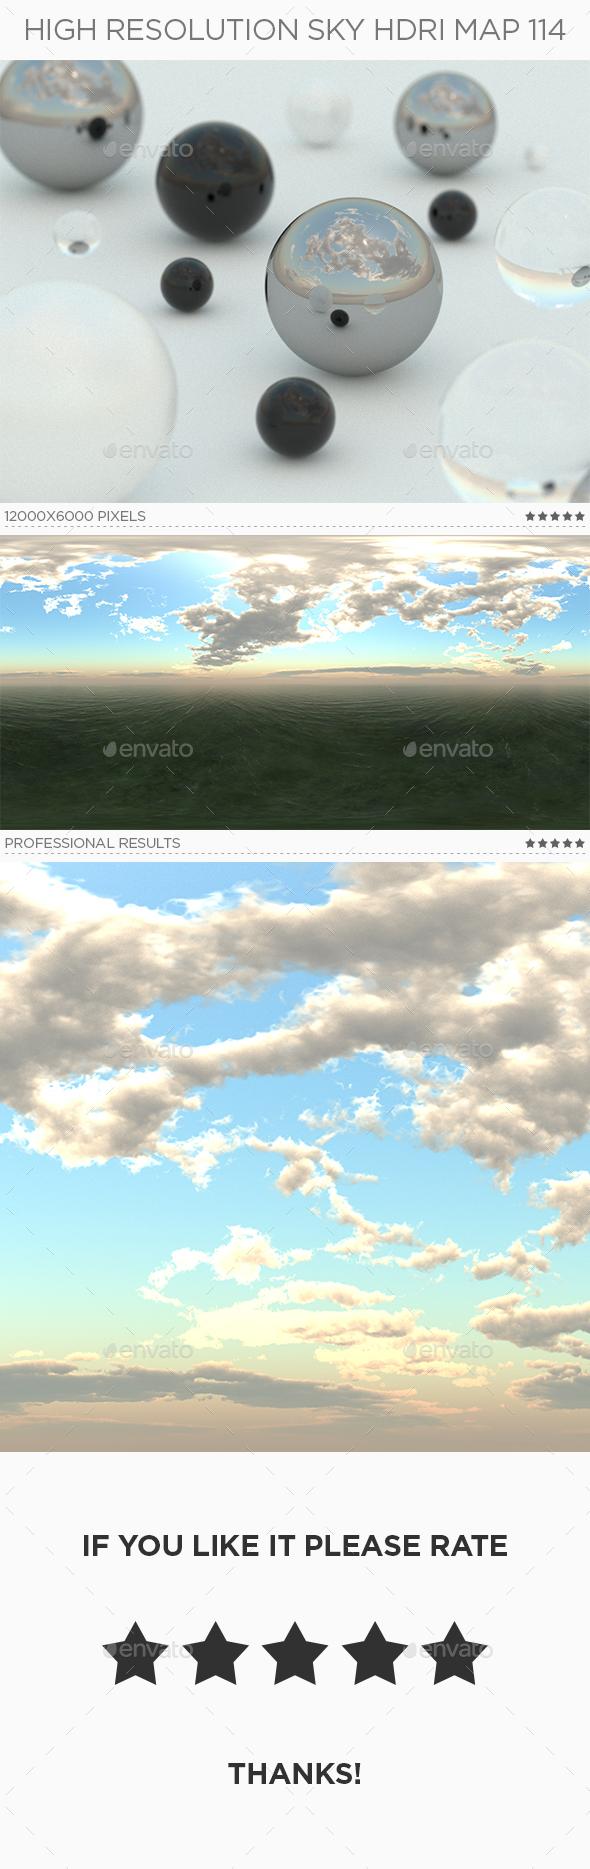 High Resolution Sky HDRi Map 114 - 3DOcean Item for Sale